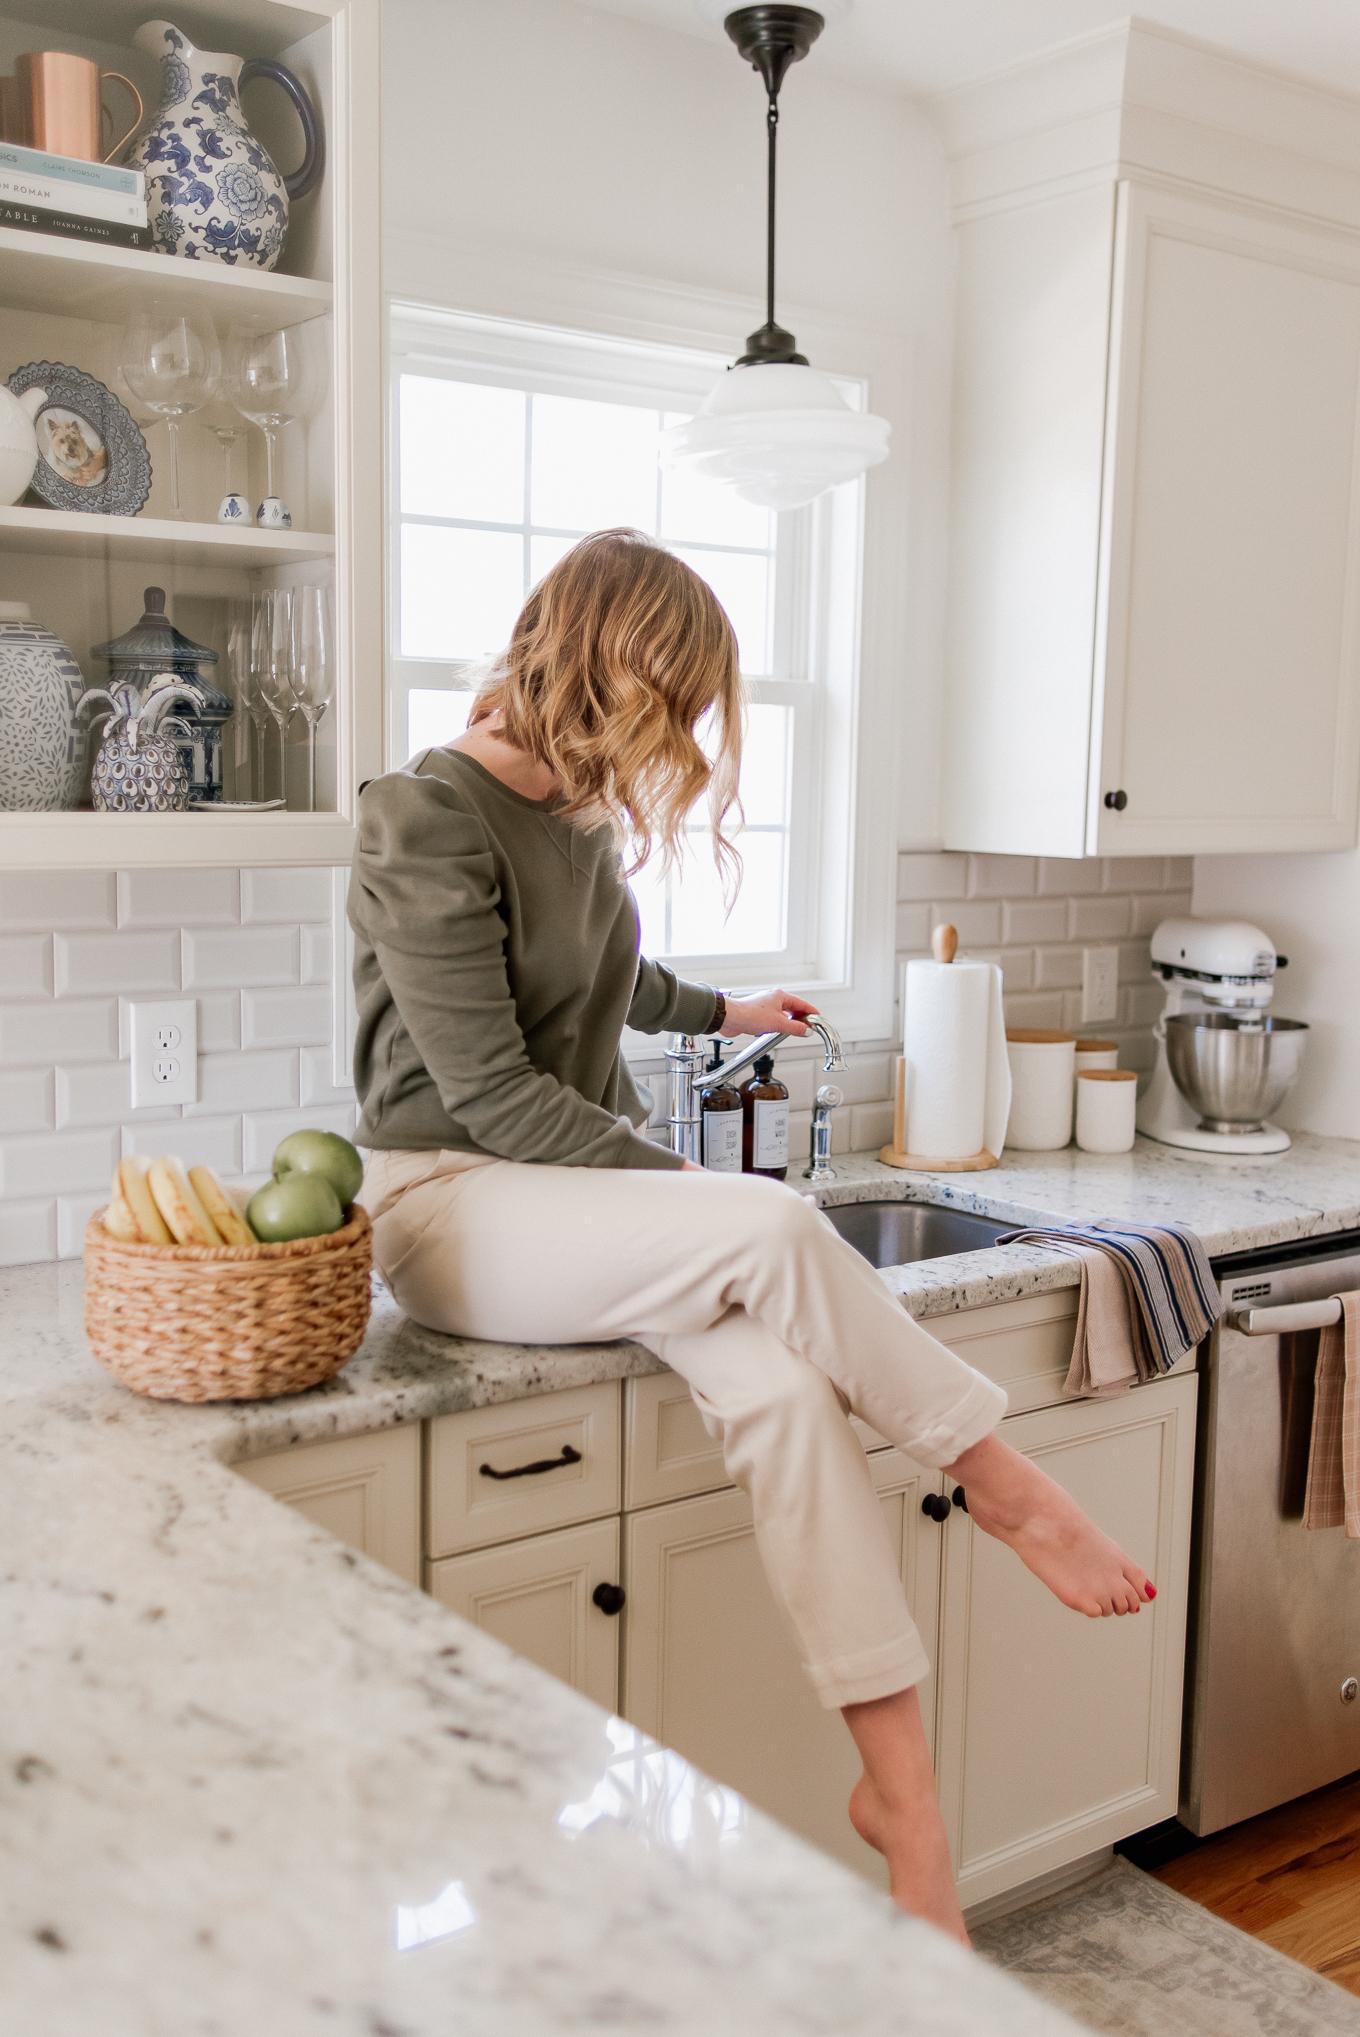 Kitchen Light Pendants, Modern Farmhouse Pendant Light | How to Decorate Your Kitchen | Louella Reese